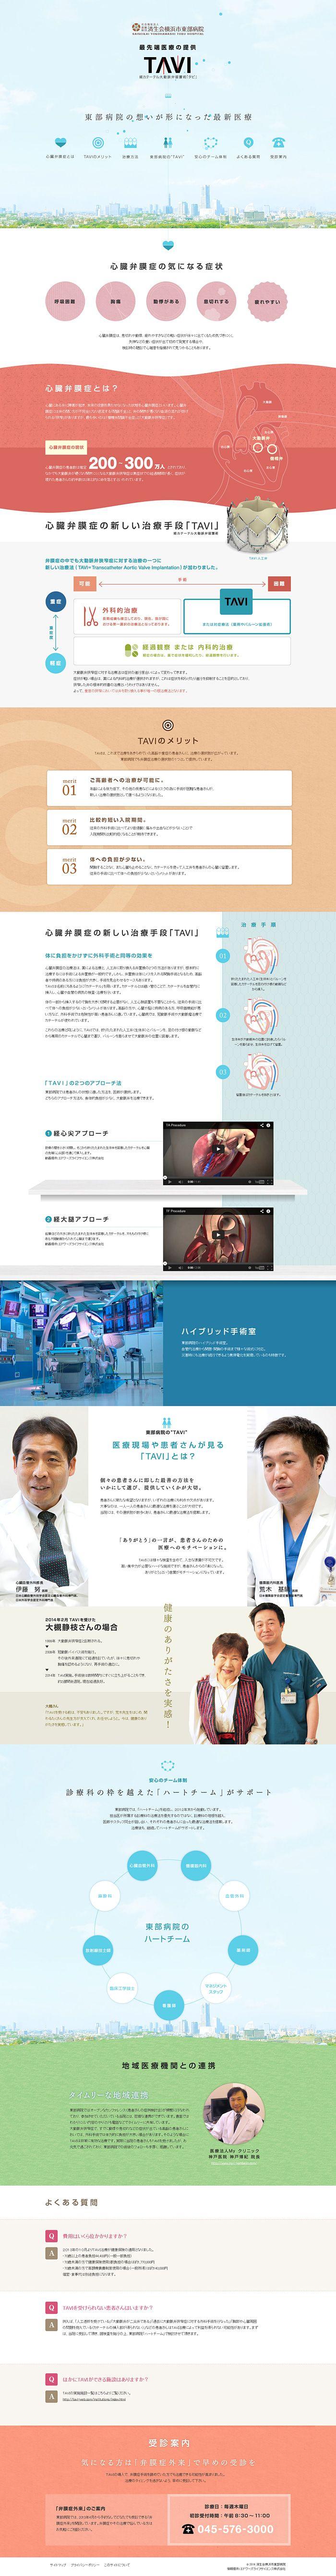 Webデザイン「東部病院の想いが形になった最先端医療「TAVI」の紹介サイト」の制作実績紹介 | キャラクターデザインとWeb制作会社のイッカ/icca